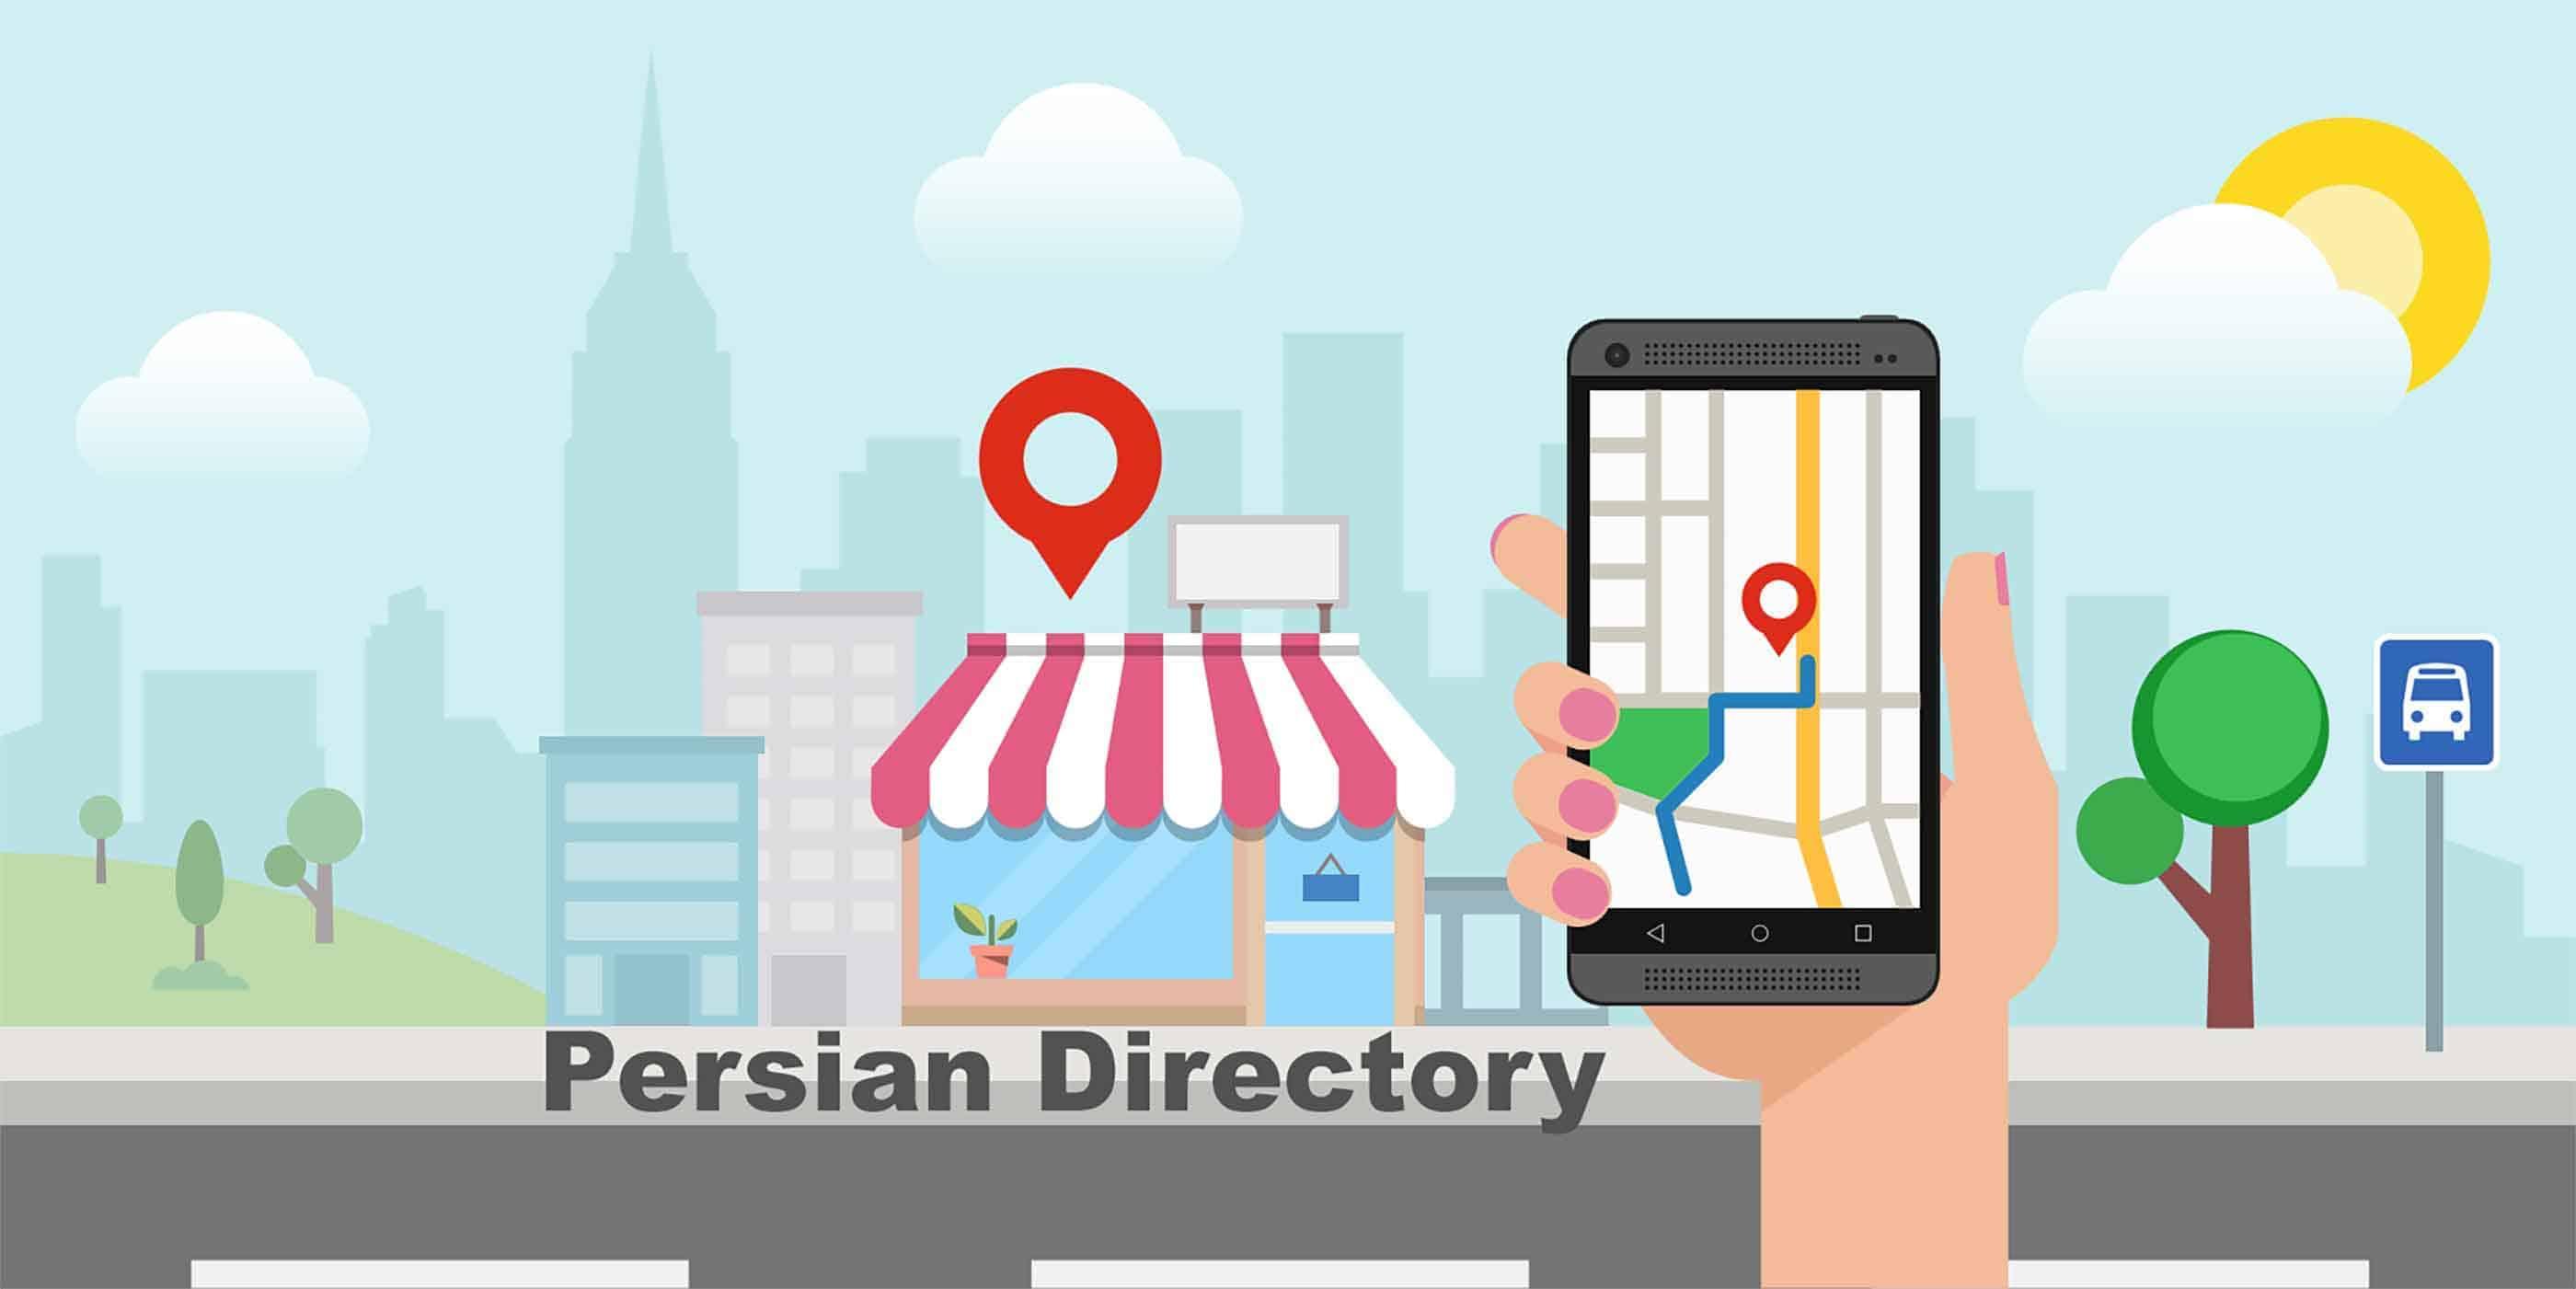 Persian Directory